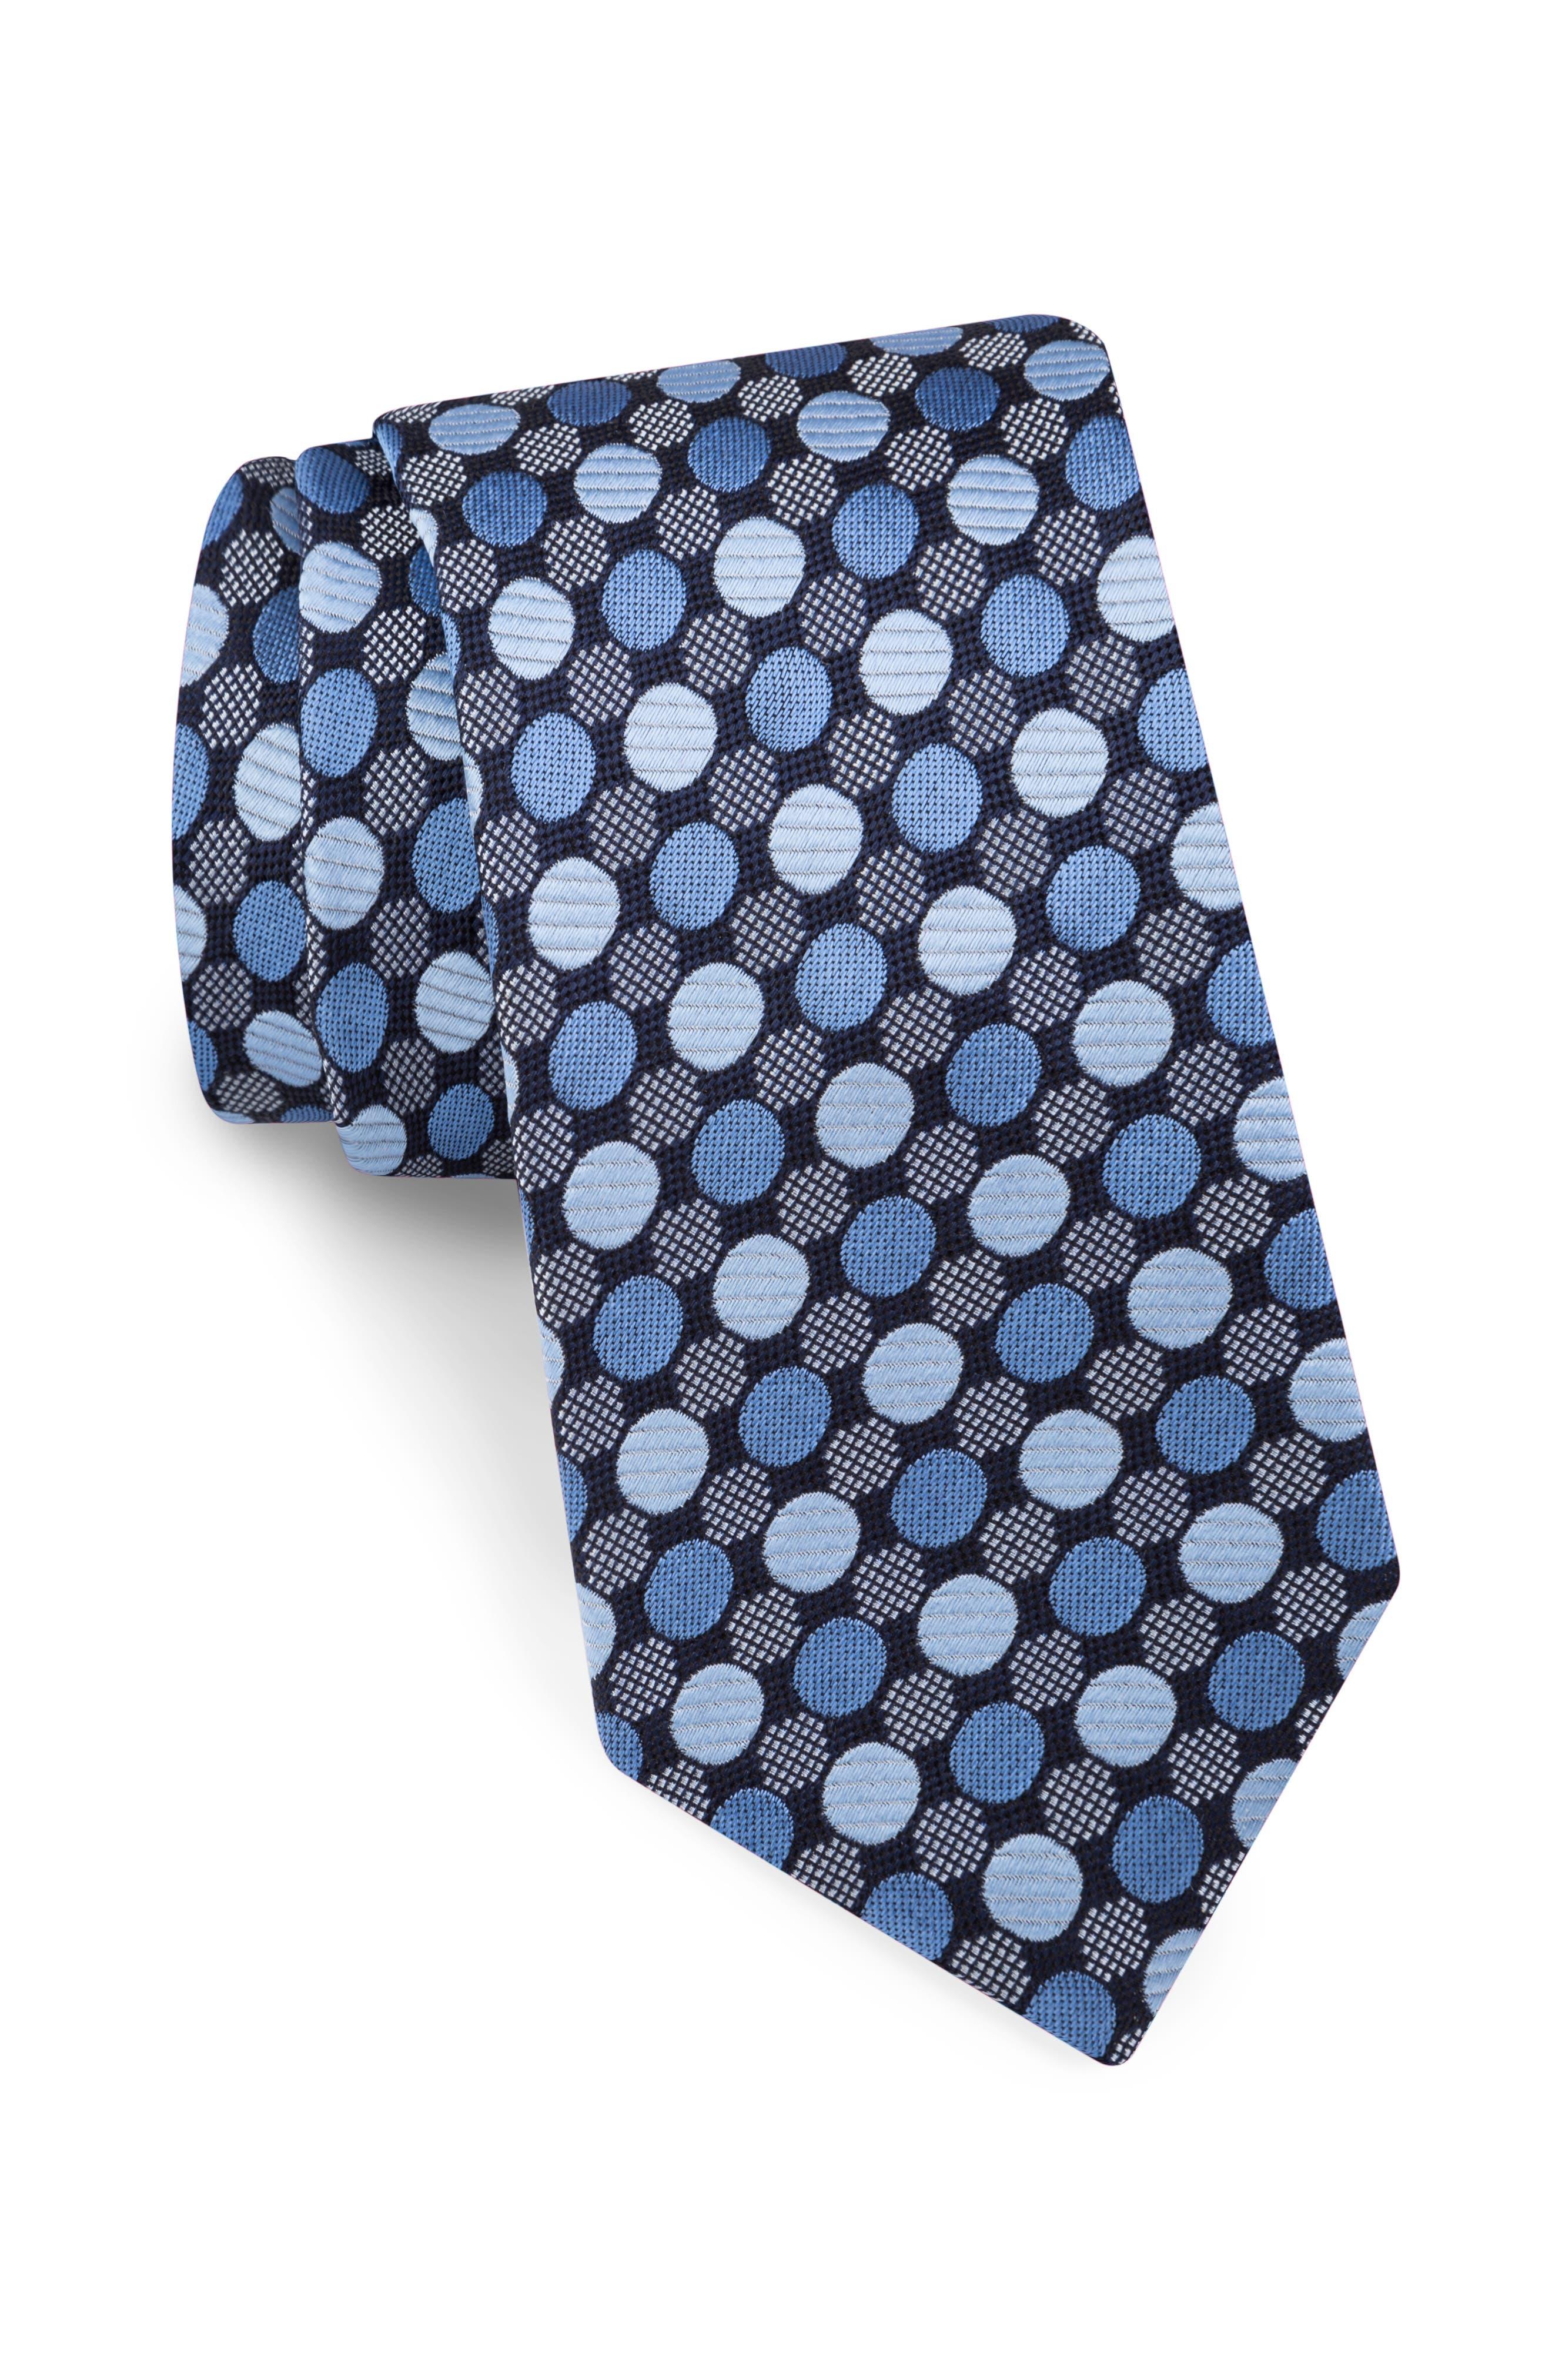 Parquet Jacquard Silk Tie,                         Main,                         color, NAVY